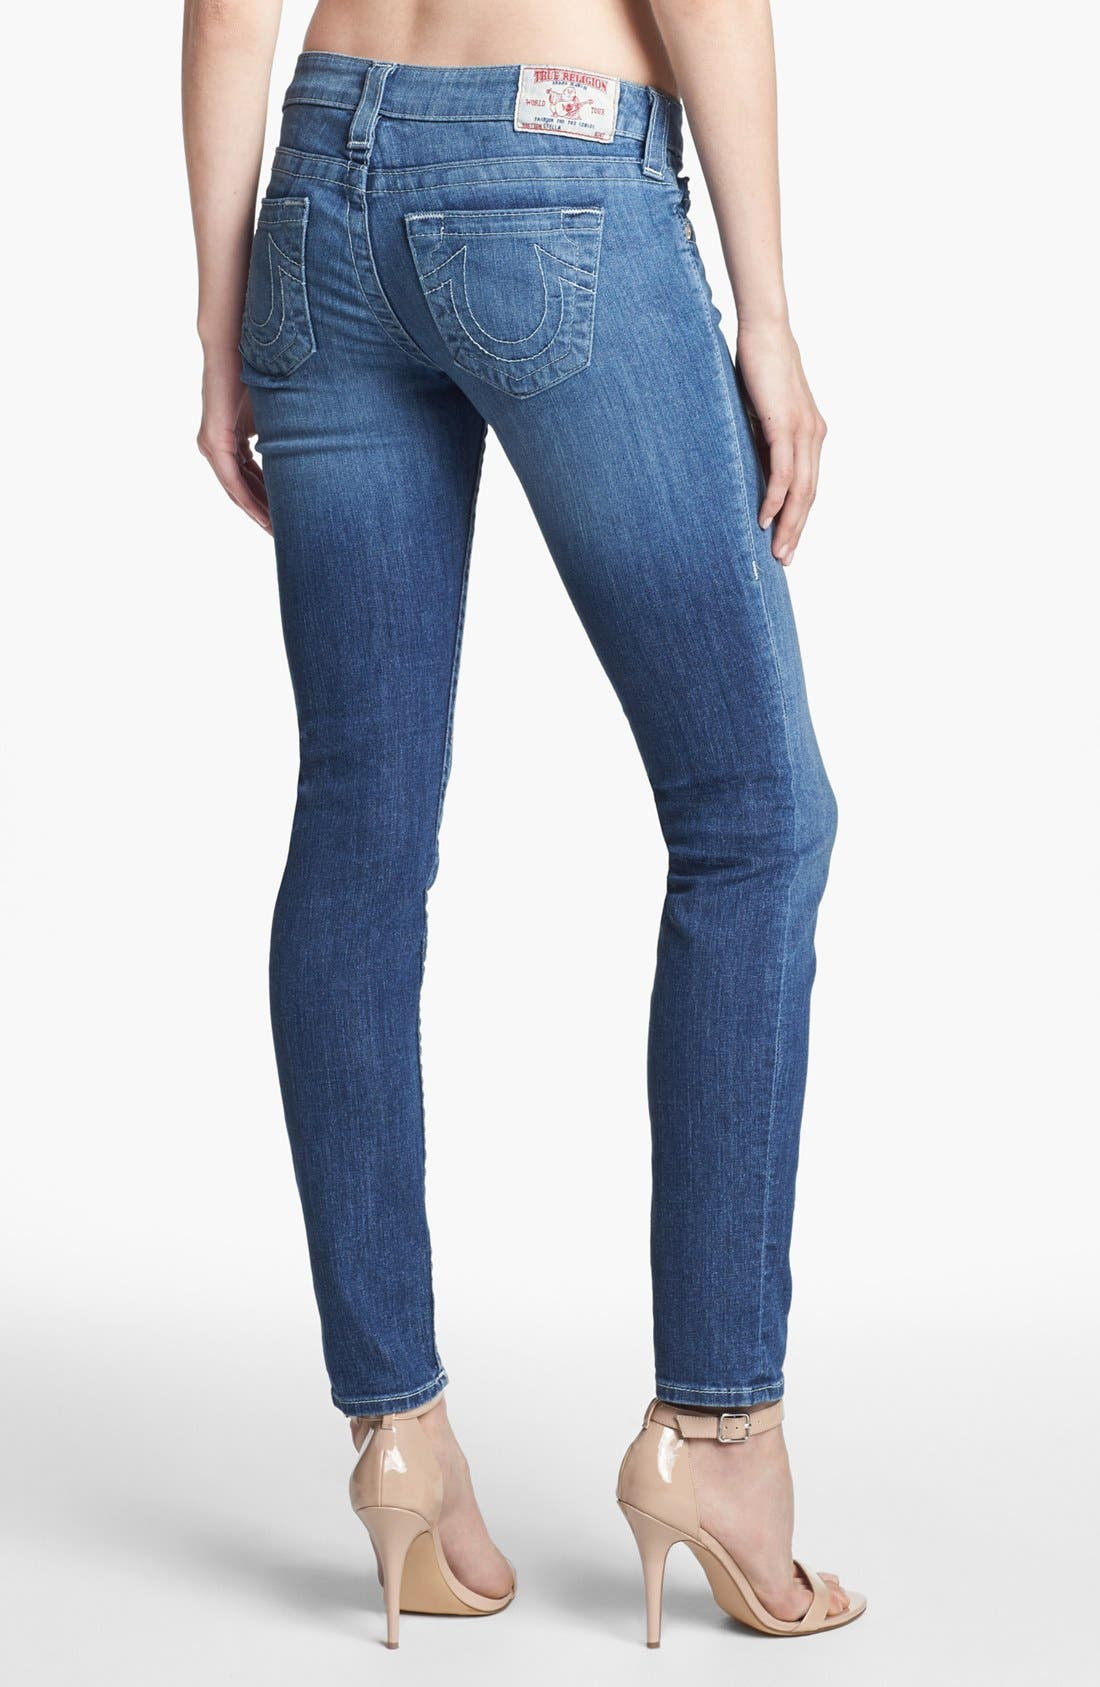 Alternate Image 2  - True Religion Brand Jeans 'Stella' Skinny Jeans (Cabin Creek)